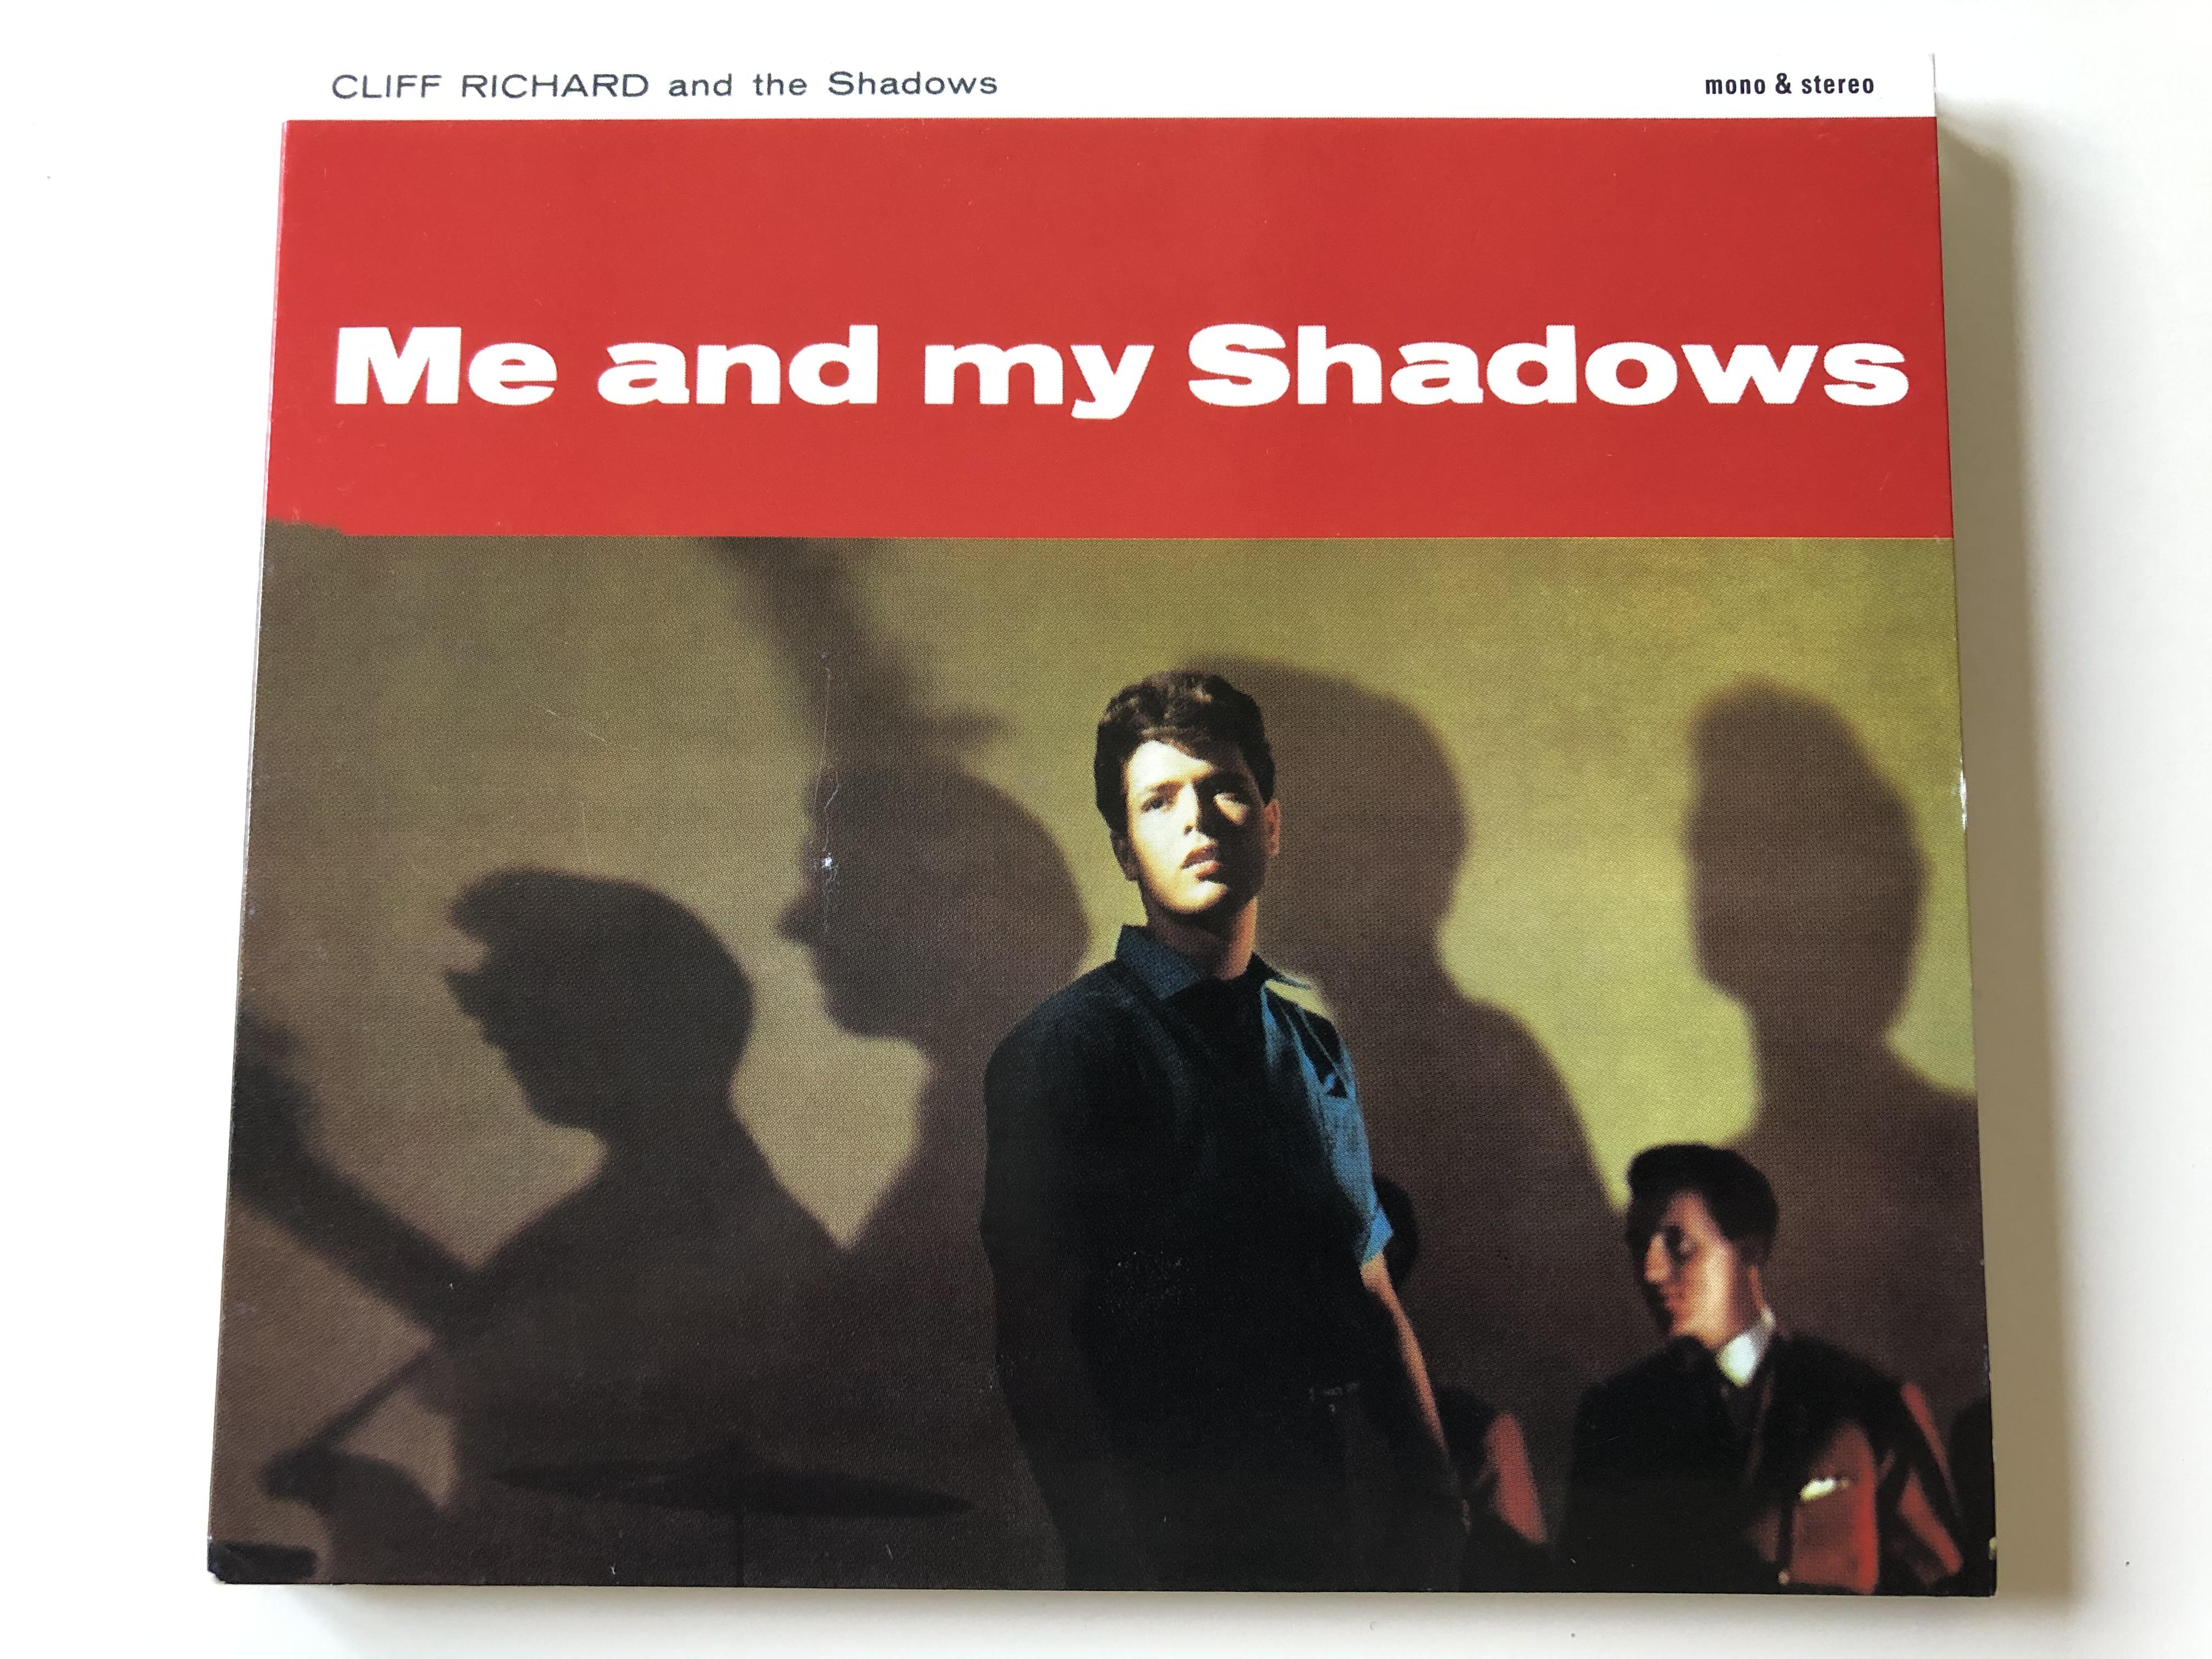 cliff-richard-and-the-shadows-me-and-my-shadows-emi-audio-cd-1998-mono-stereo-724349544024-1-.jpg